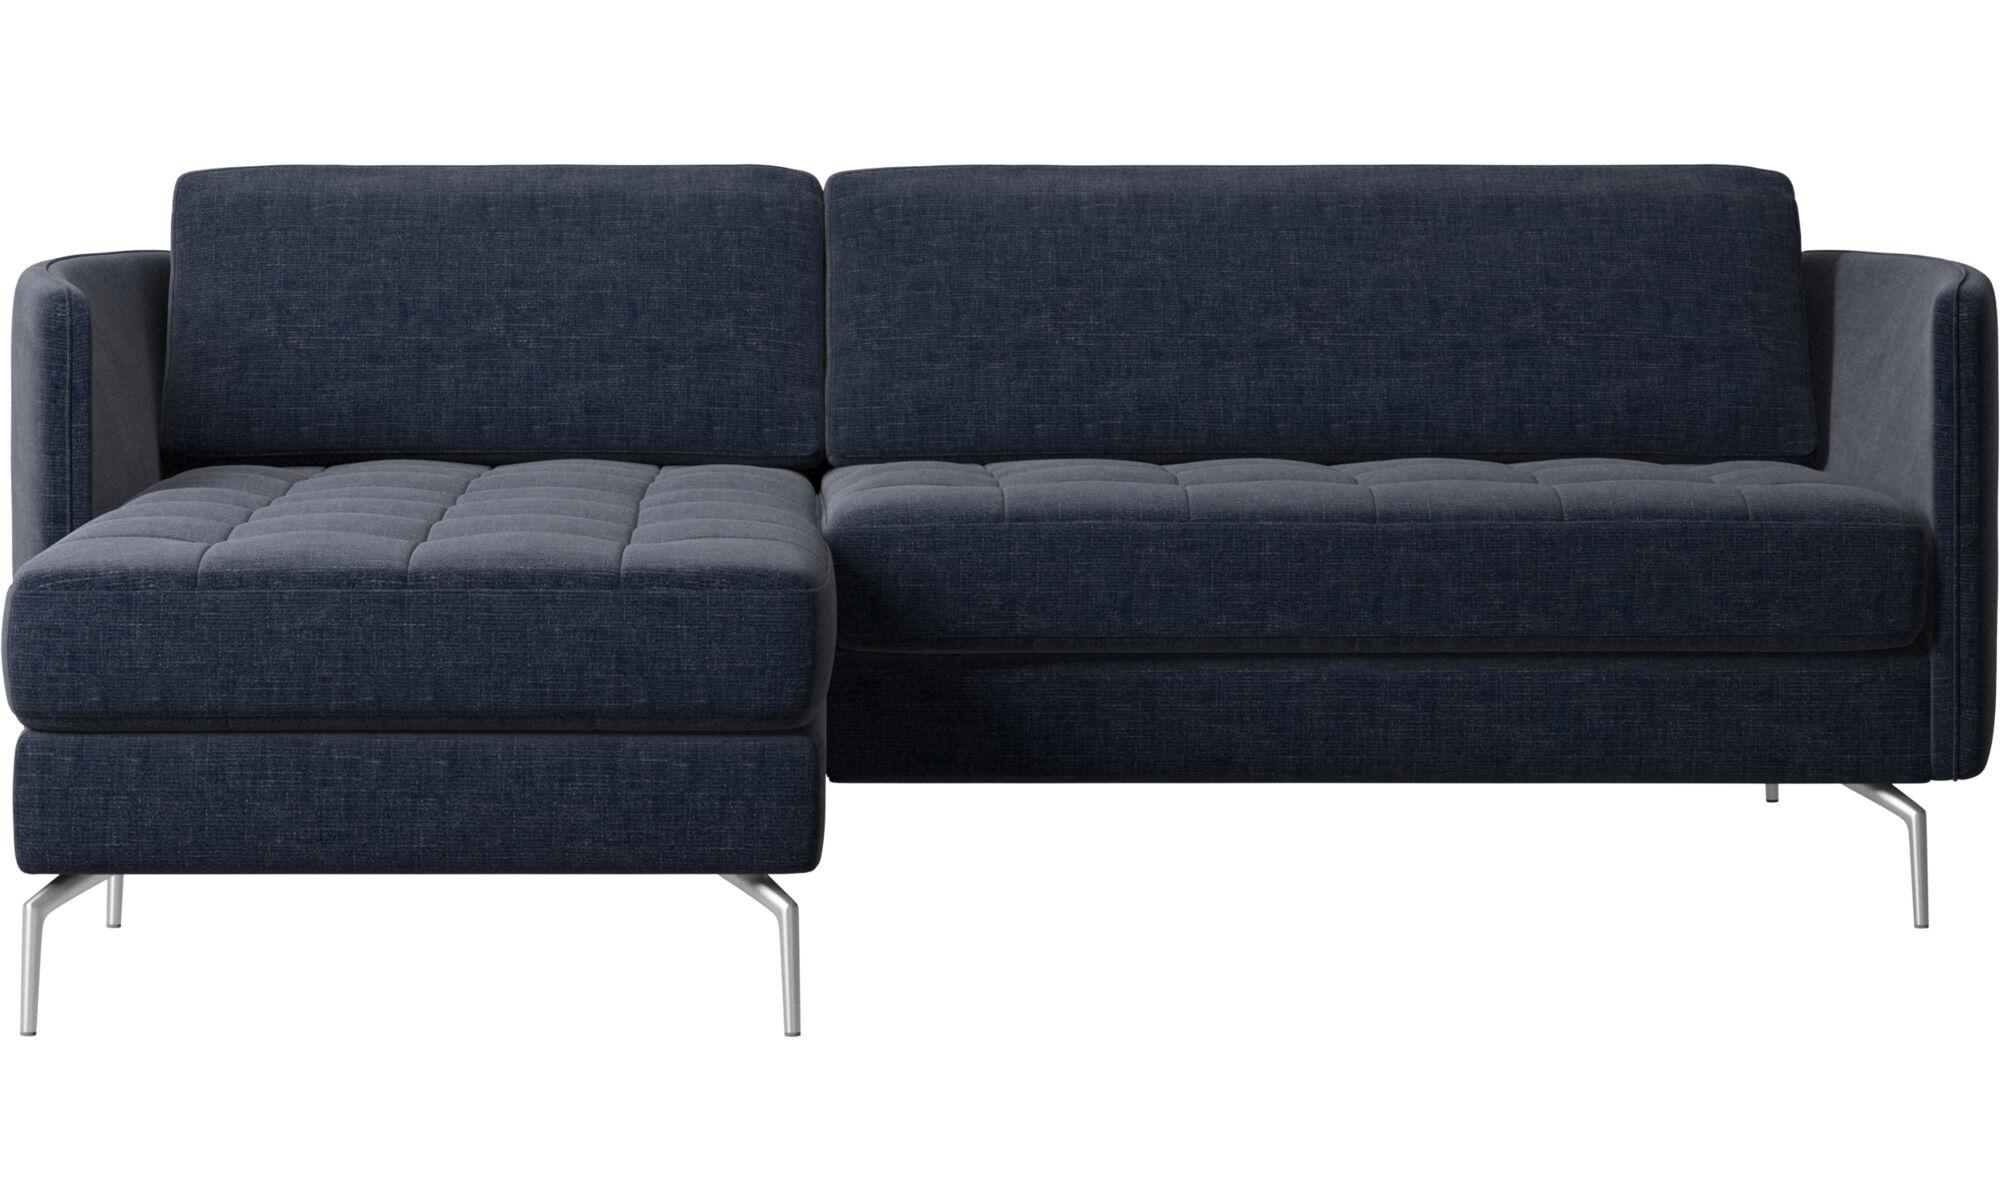 Sofaer Med Chaiselong Moderne Dansk Design Boconcept